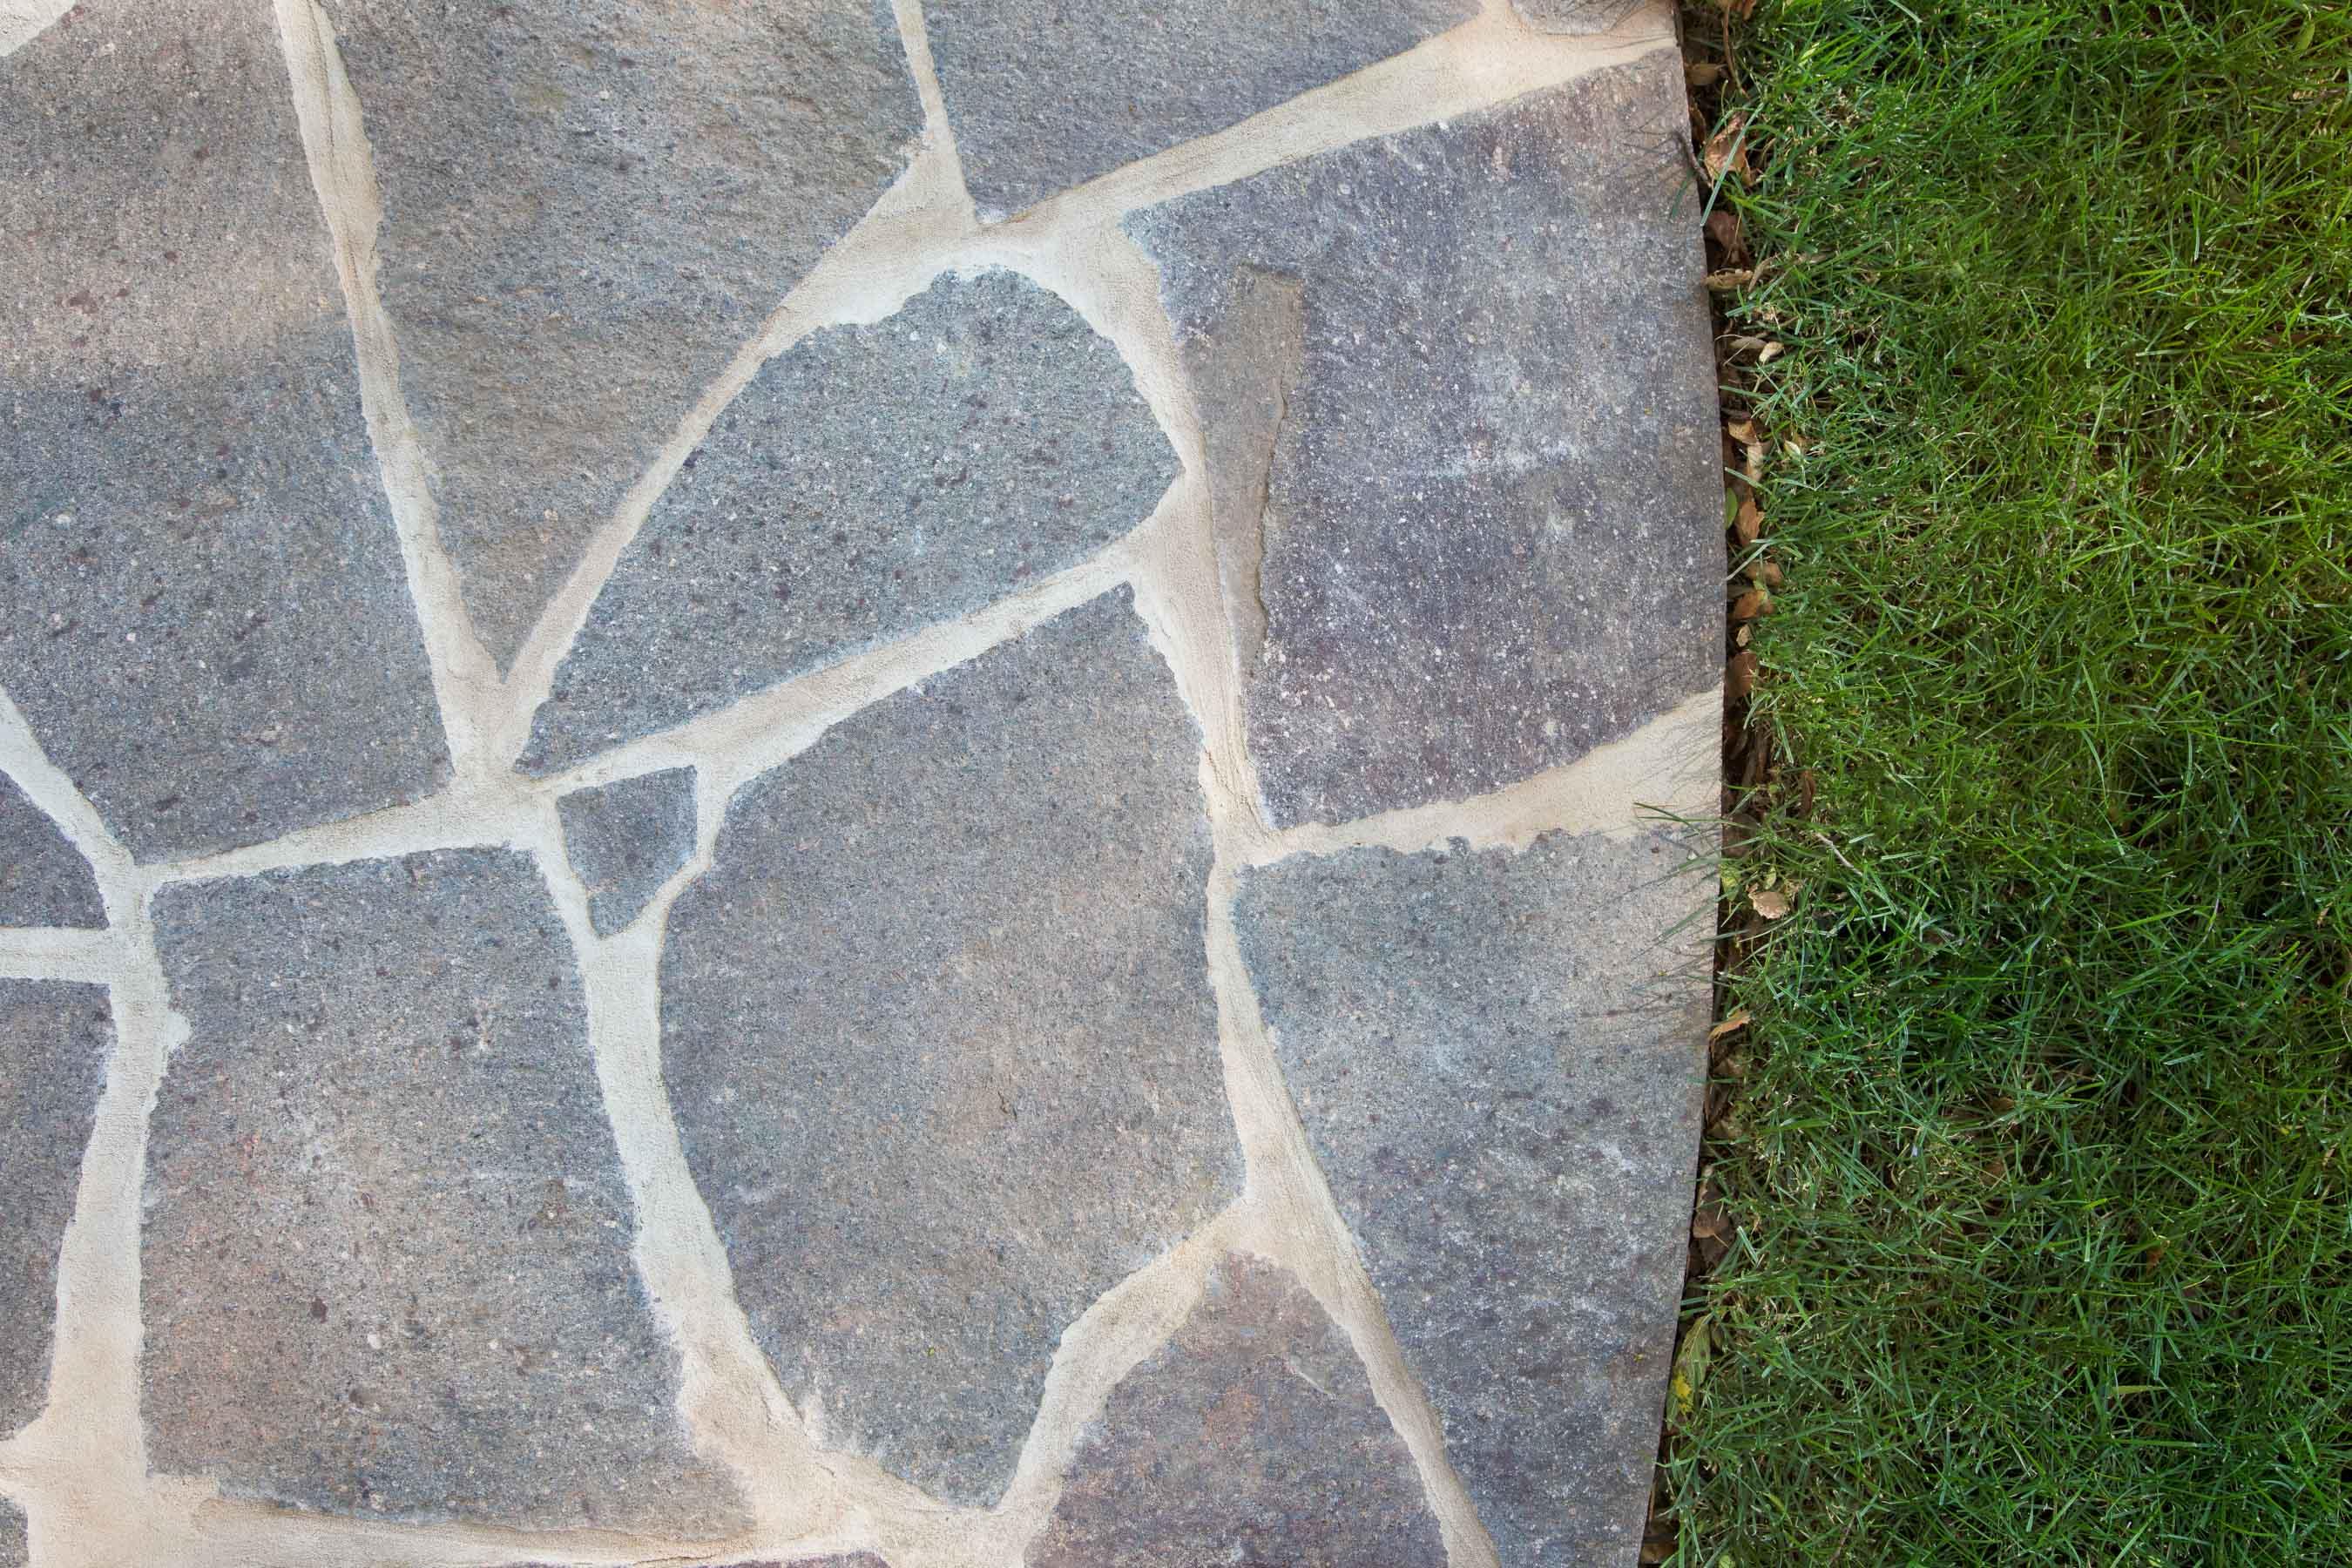 Stone-Crazy-Paving Gallery porphyry-crazy-paving-02